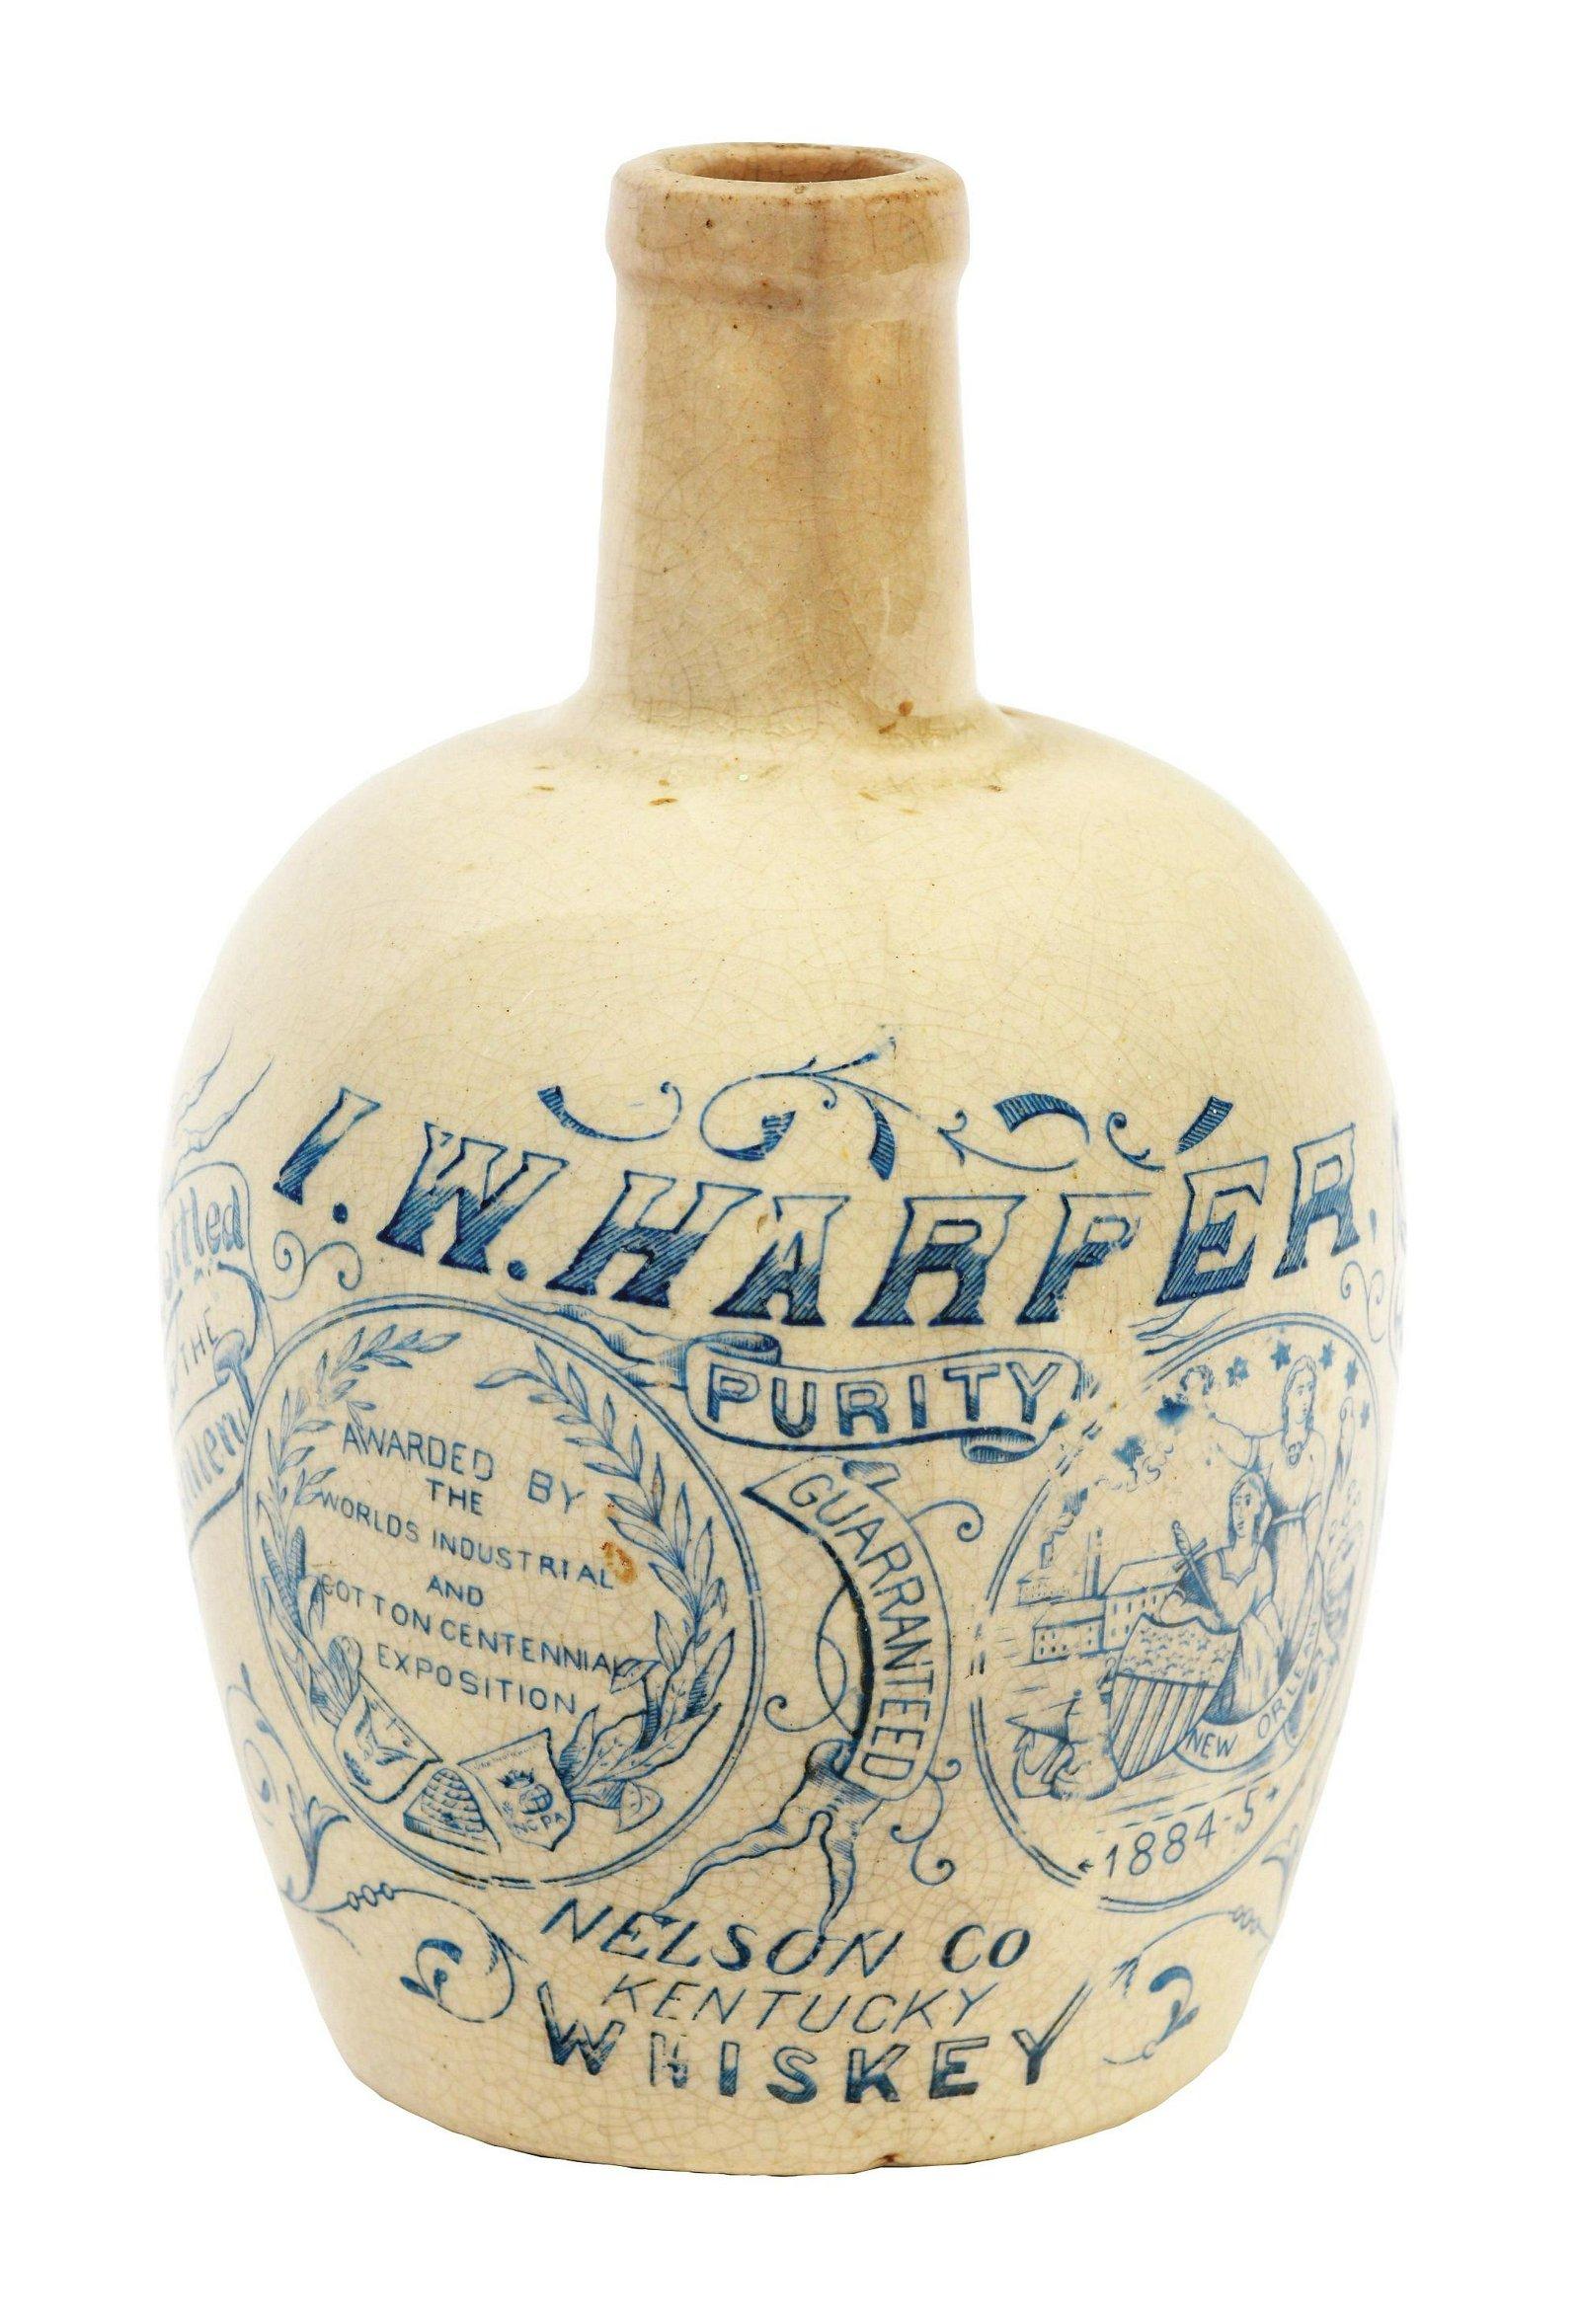 I. W. Harper Nelson Co. Kentucky Whiskey Jug.